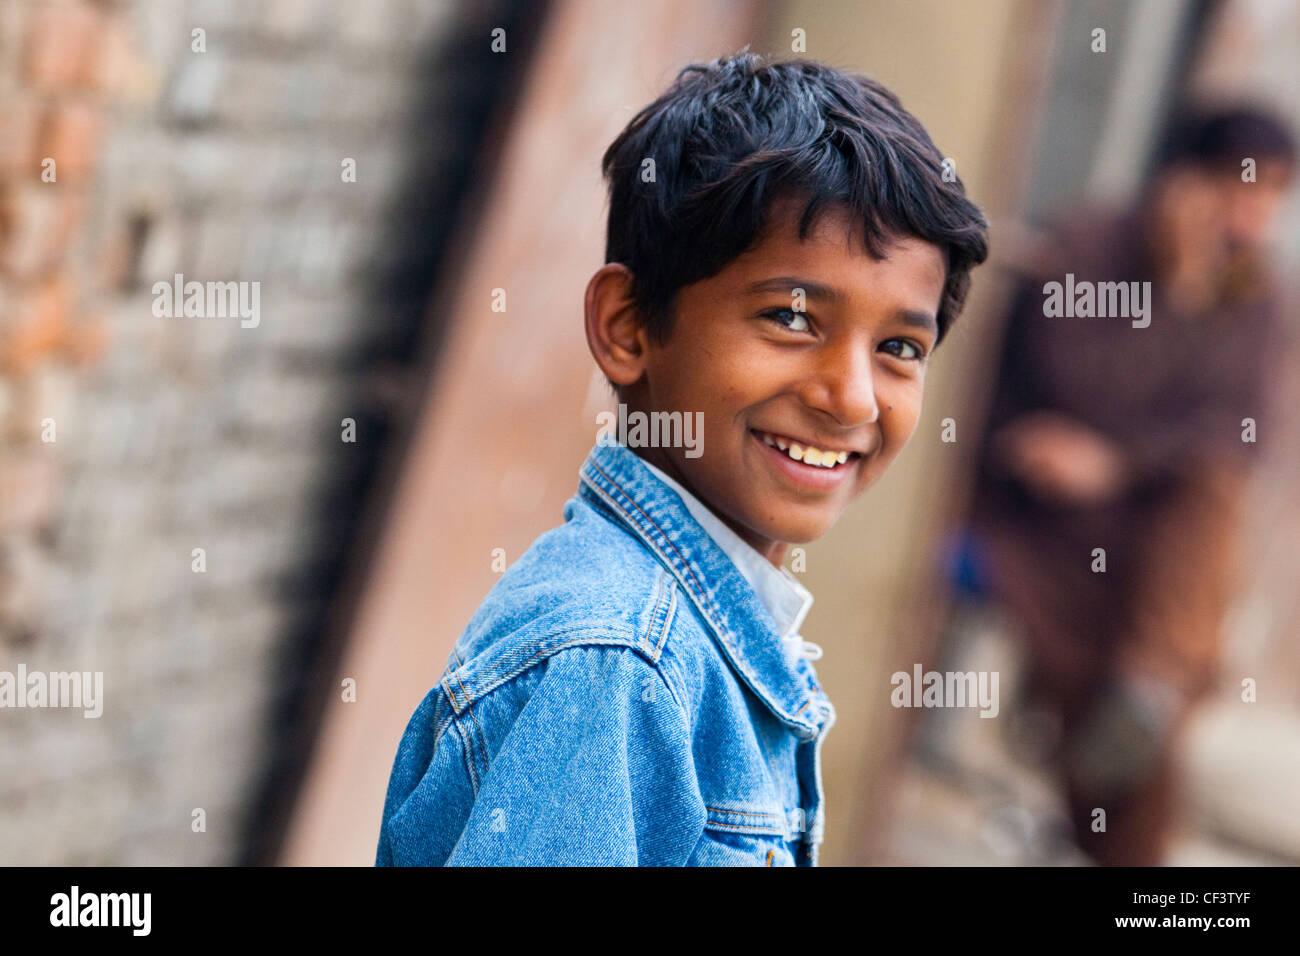 Smiling Pakistani boy, Islamabad, Pakistan - Stock Image